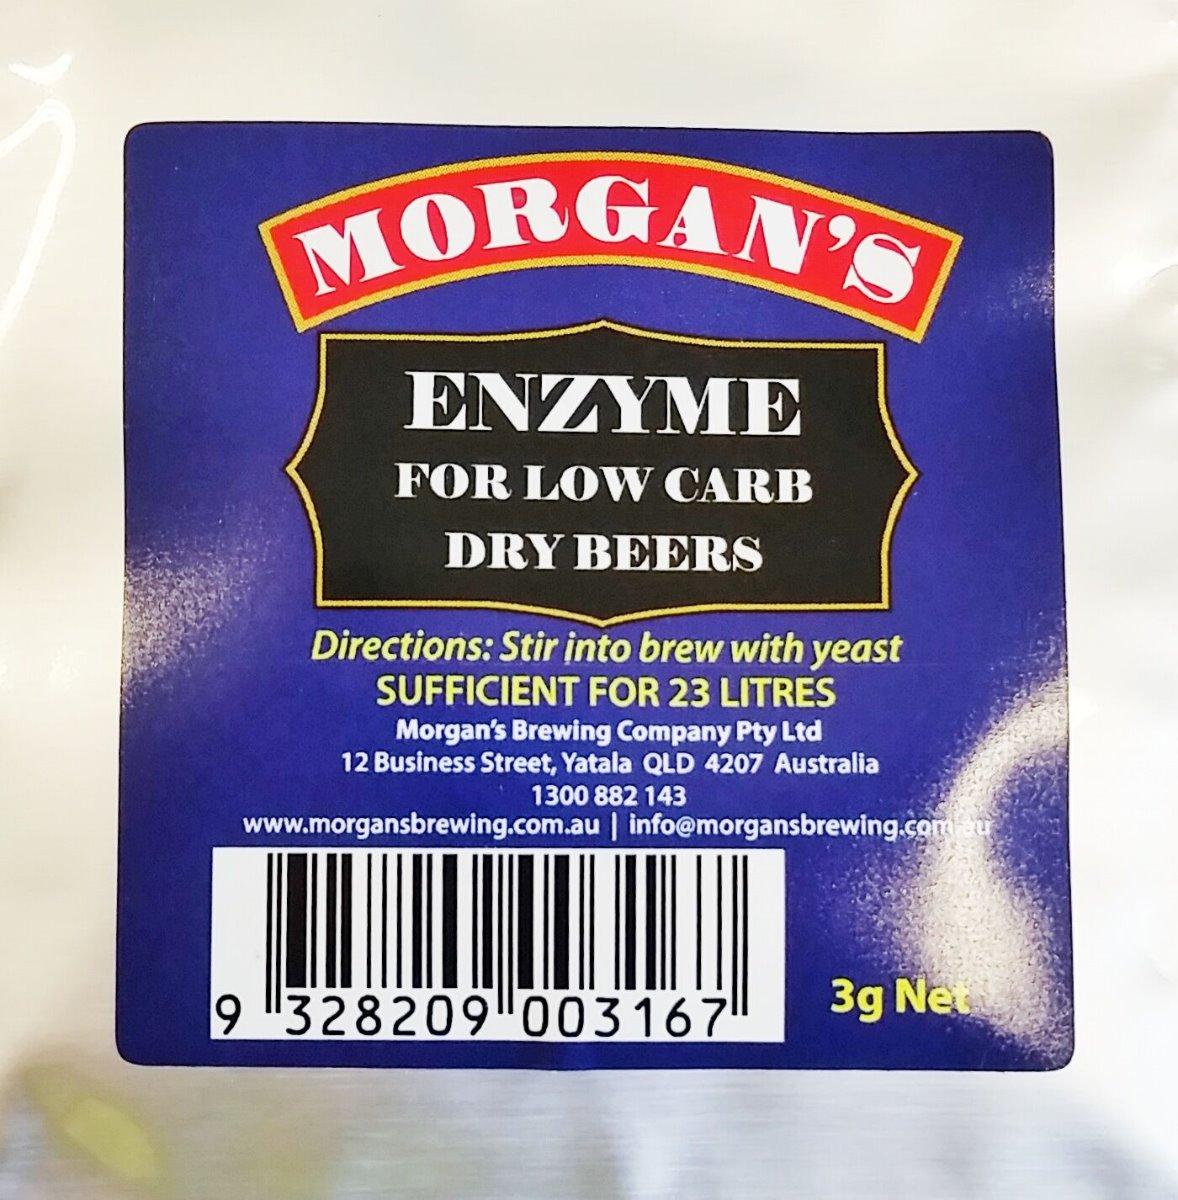 Morgan's Low Carb Enzyme